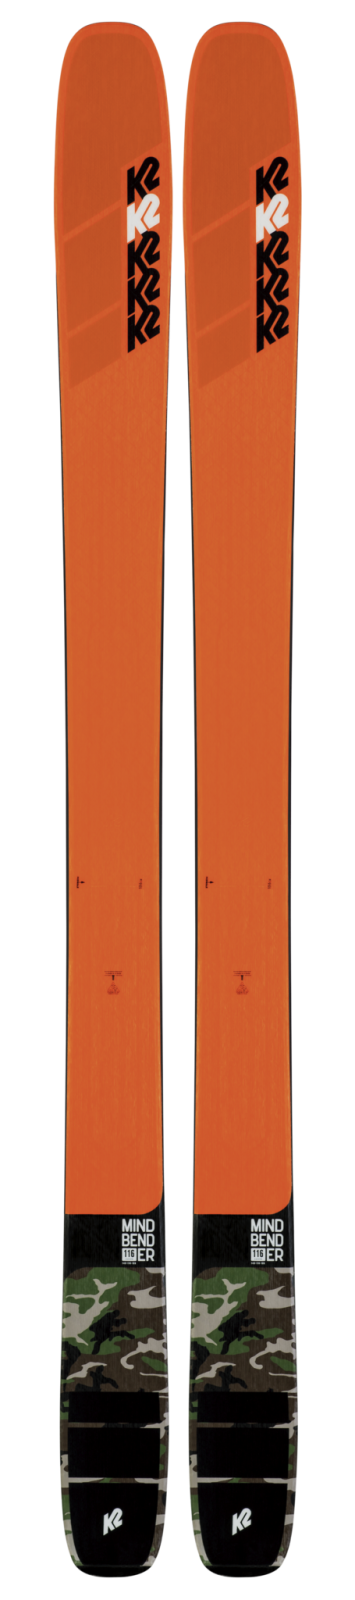 K2 Mindbender 116C Skis 2020